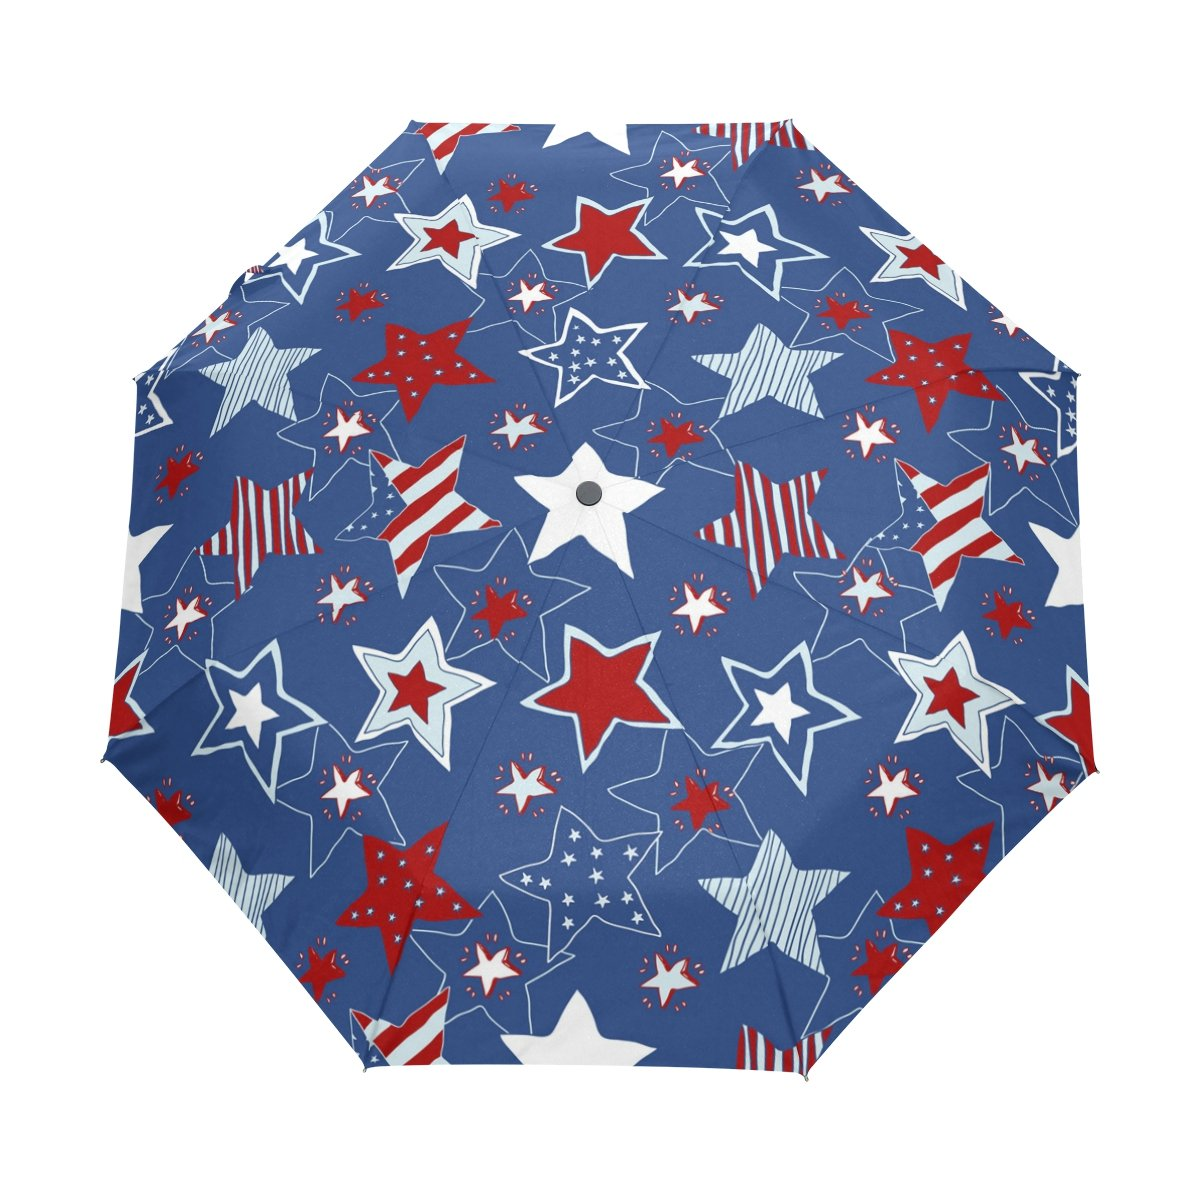 deyya Stars and Stripesシームレスなパターン防風旅行傘自動的に開く閉じる軽量コンパクトゴルフ傘 B075GMFBZP